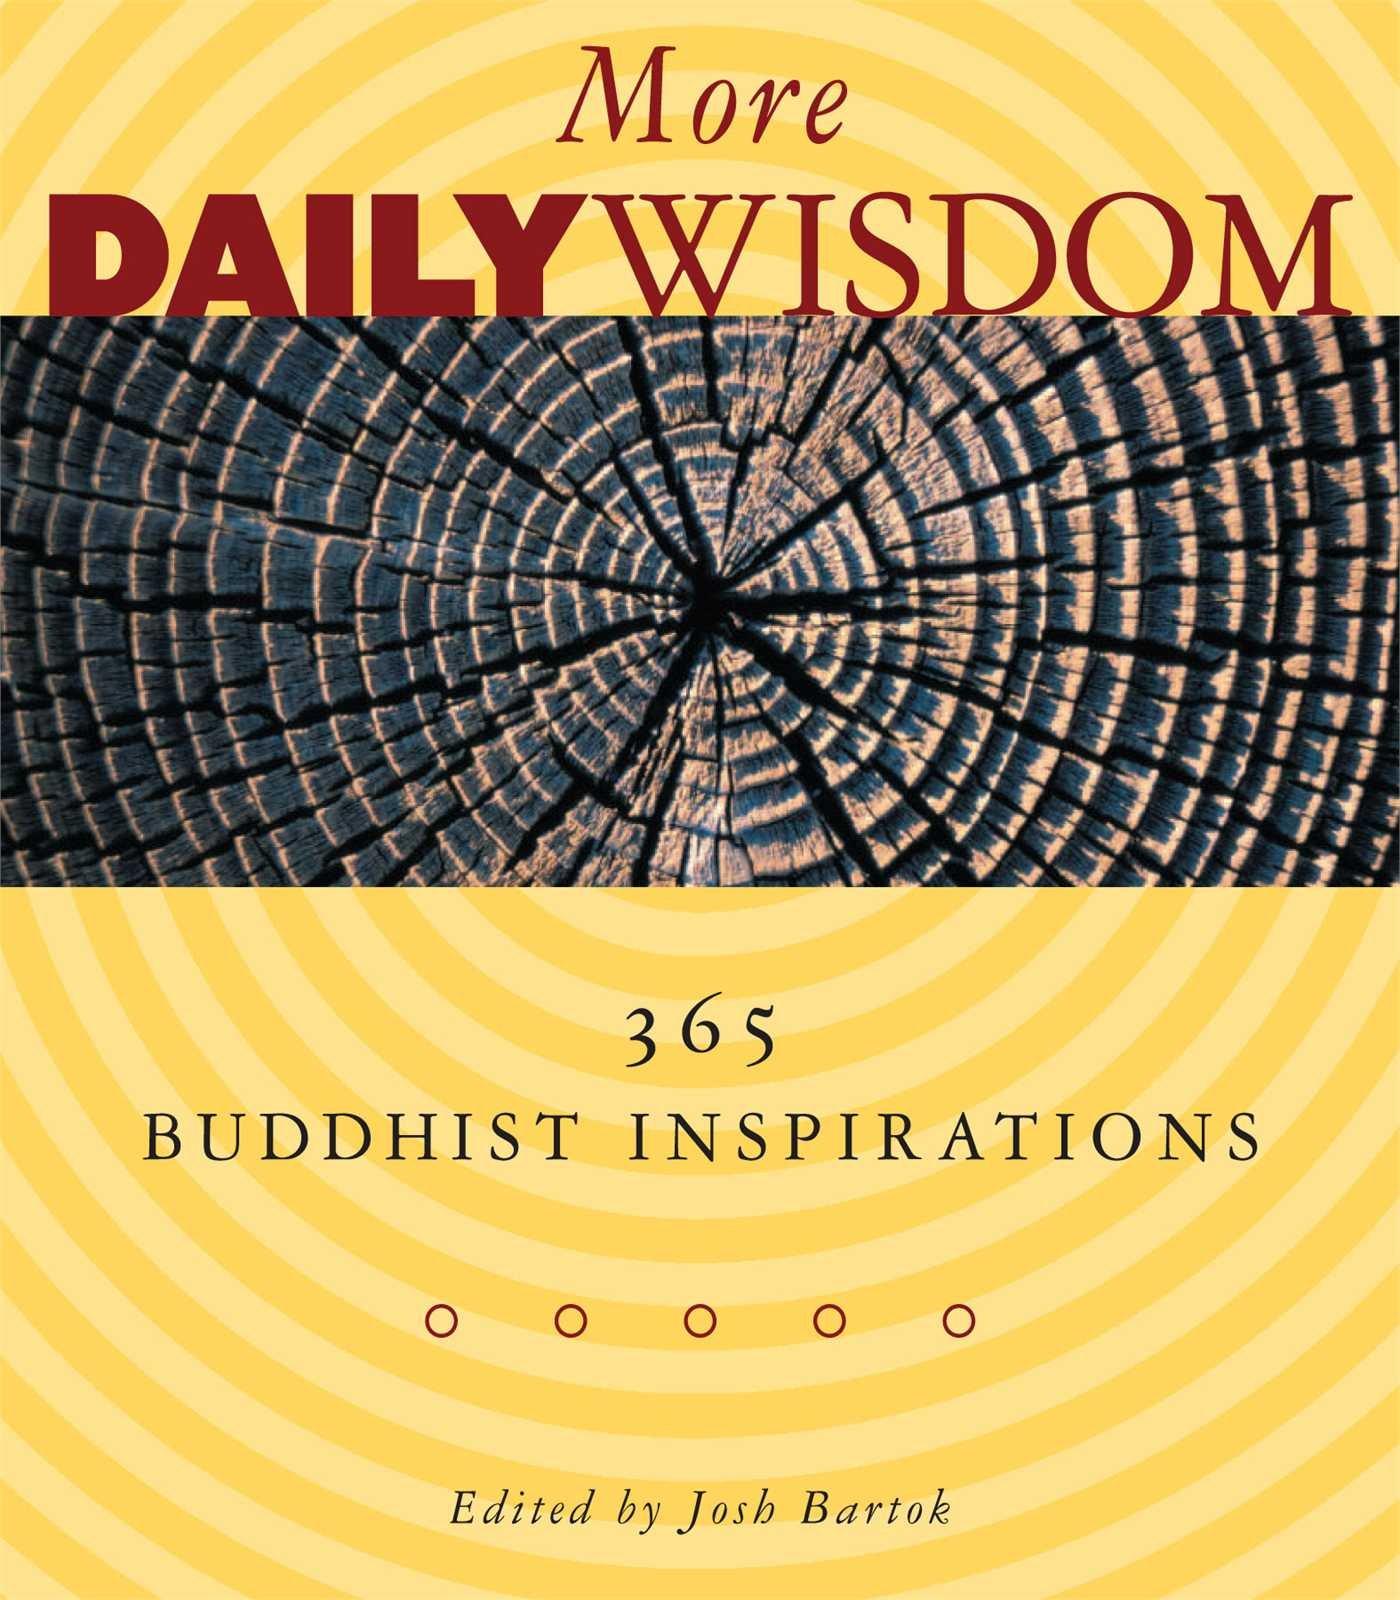 More Daily Wisdom: 365 Buddhist Inspirations: Josh Bartok: 9780861712960:  Amazon: Books